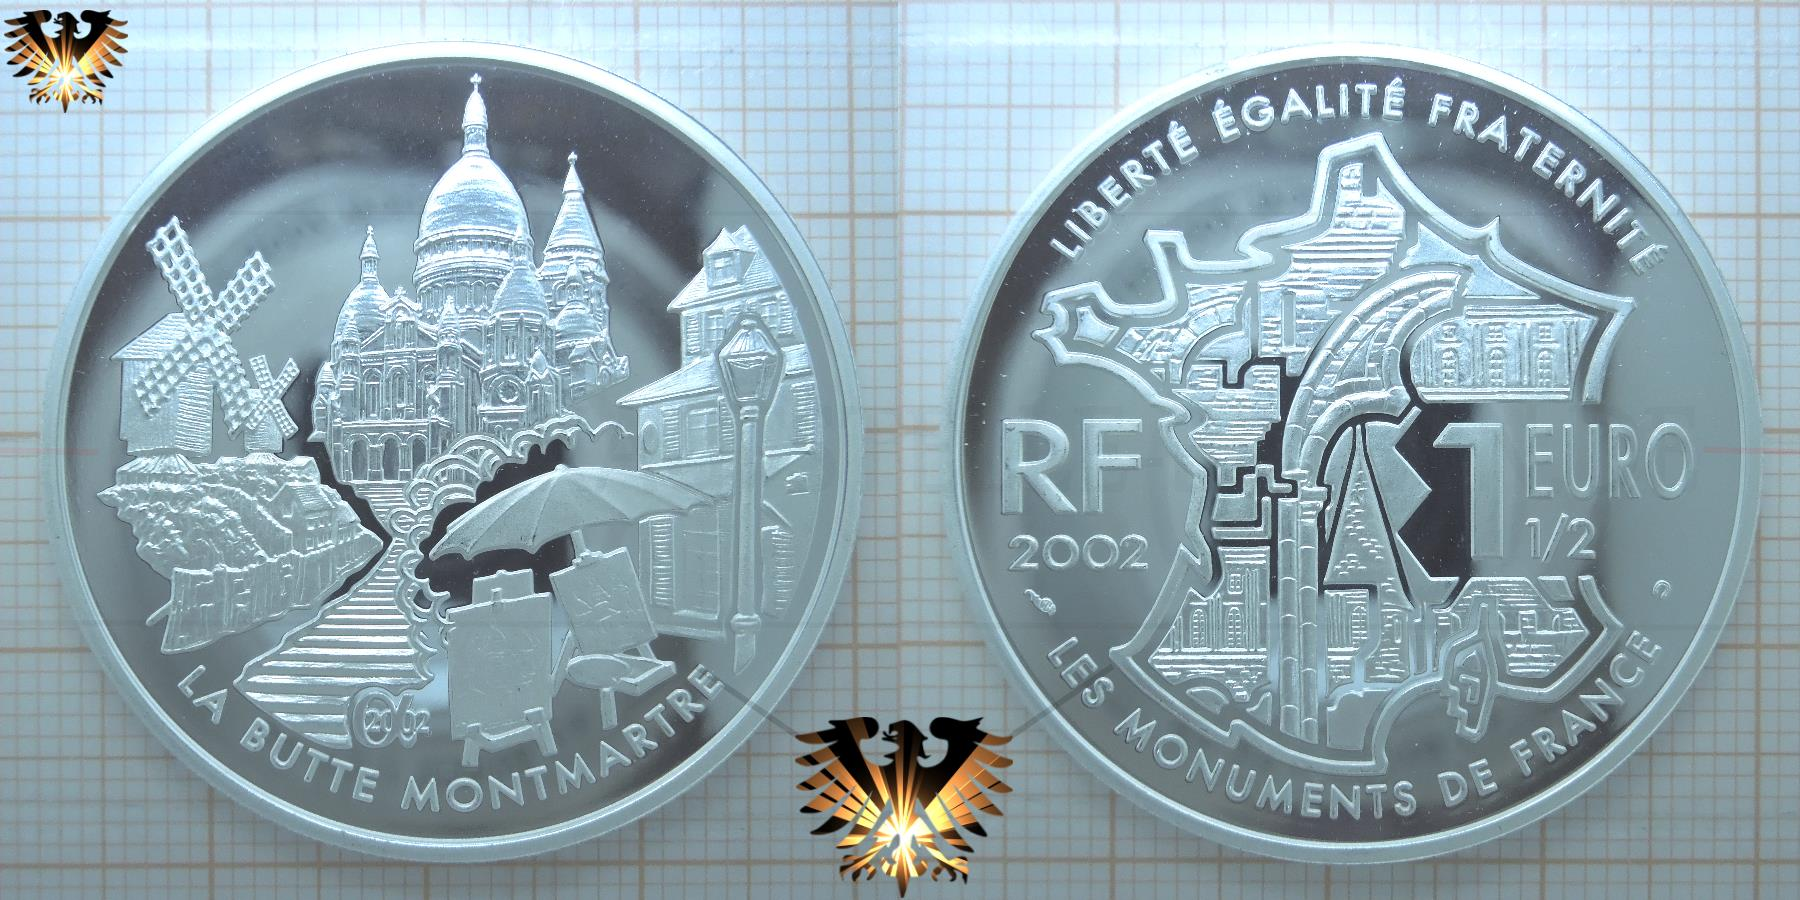 Frankreich 1 12 Euro Münze 2002 Rf La Butte Montmatre